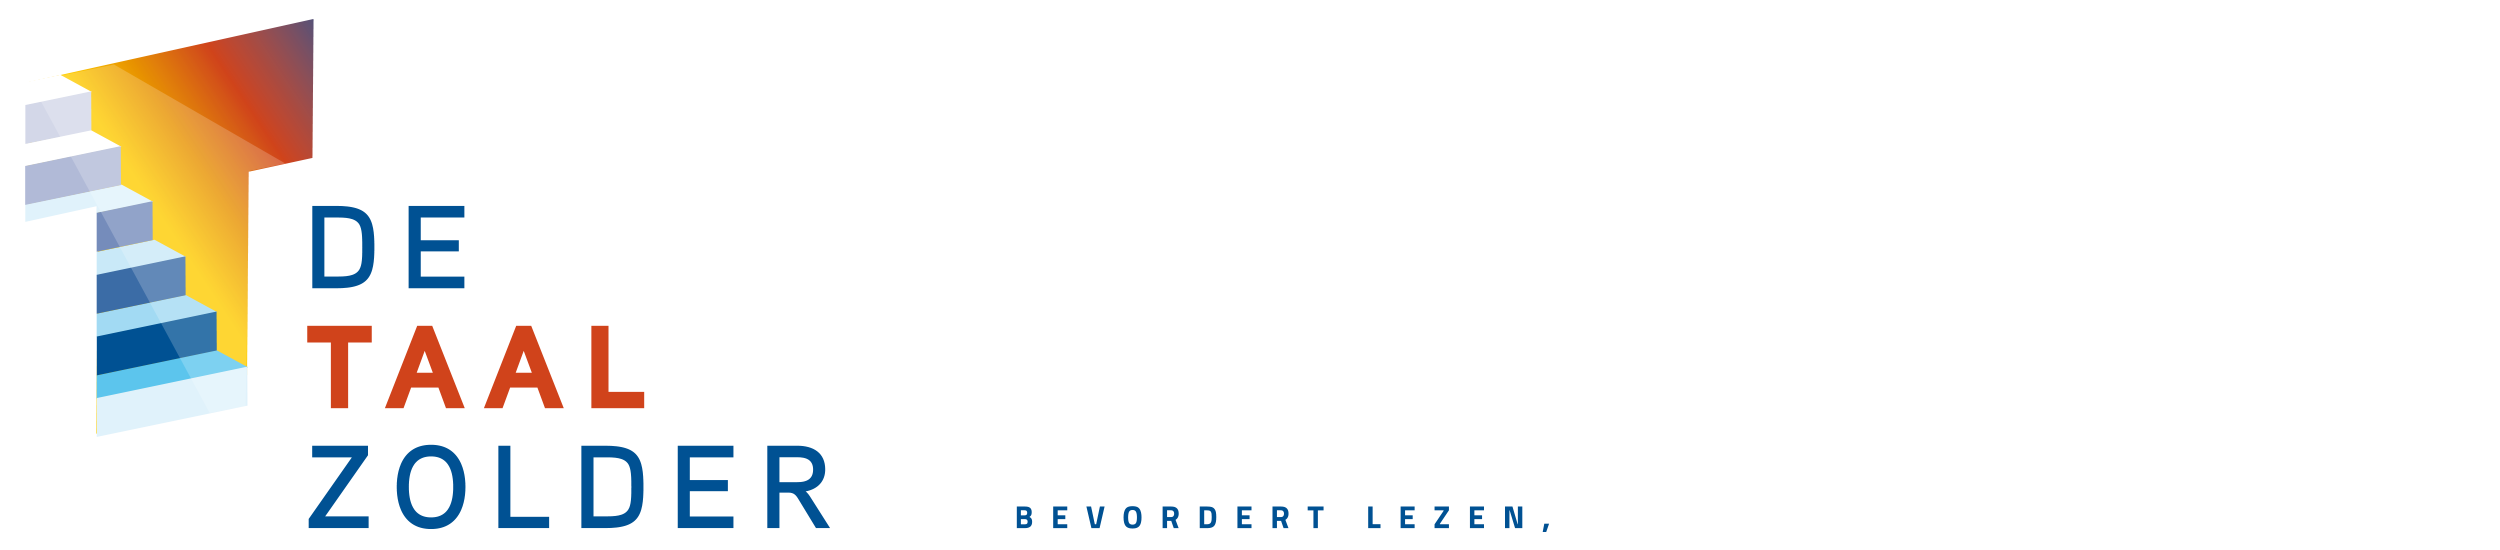 Taalzolder_logo en payoff